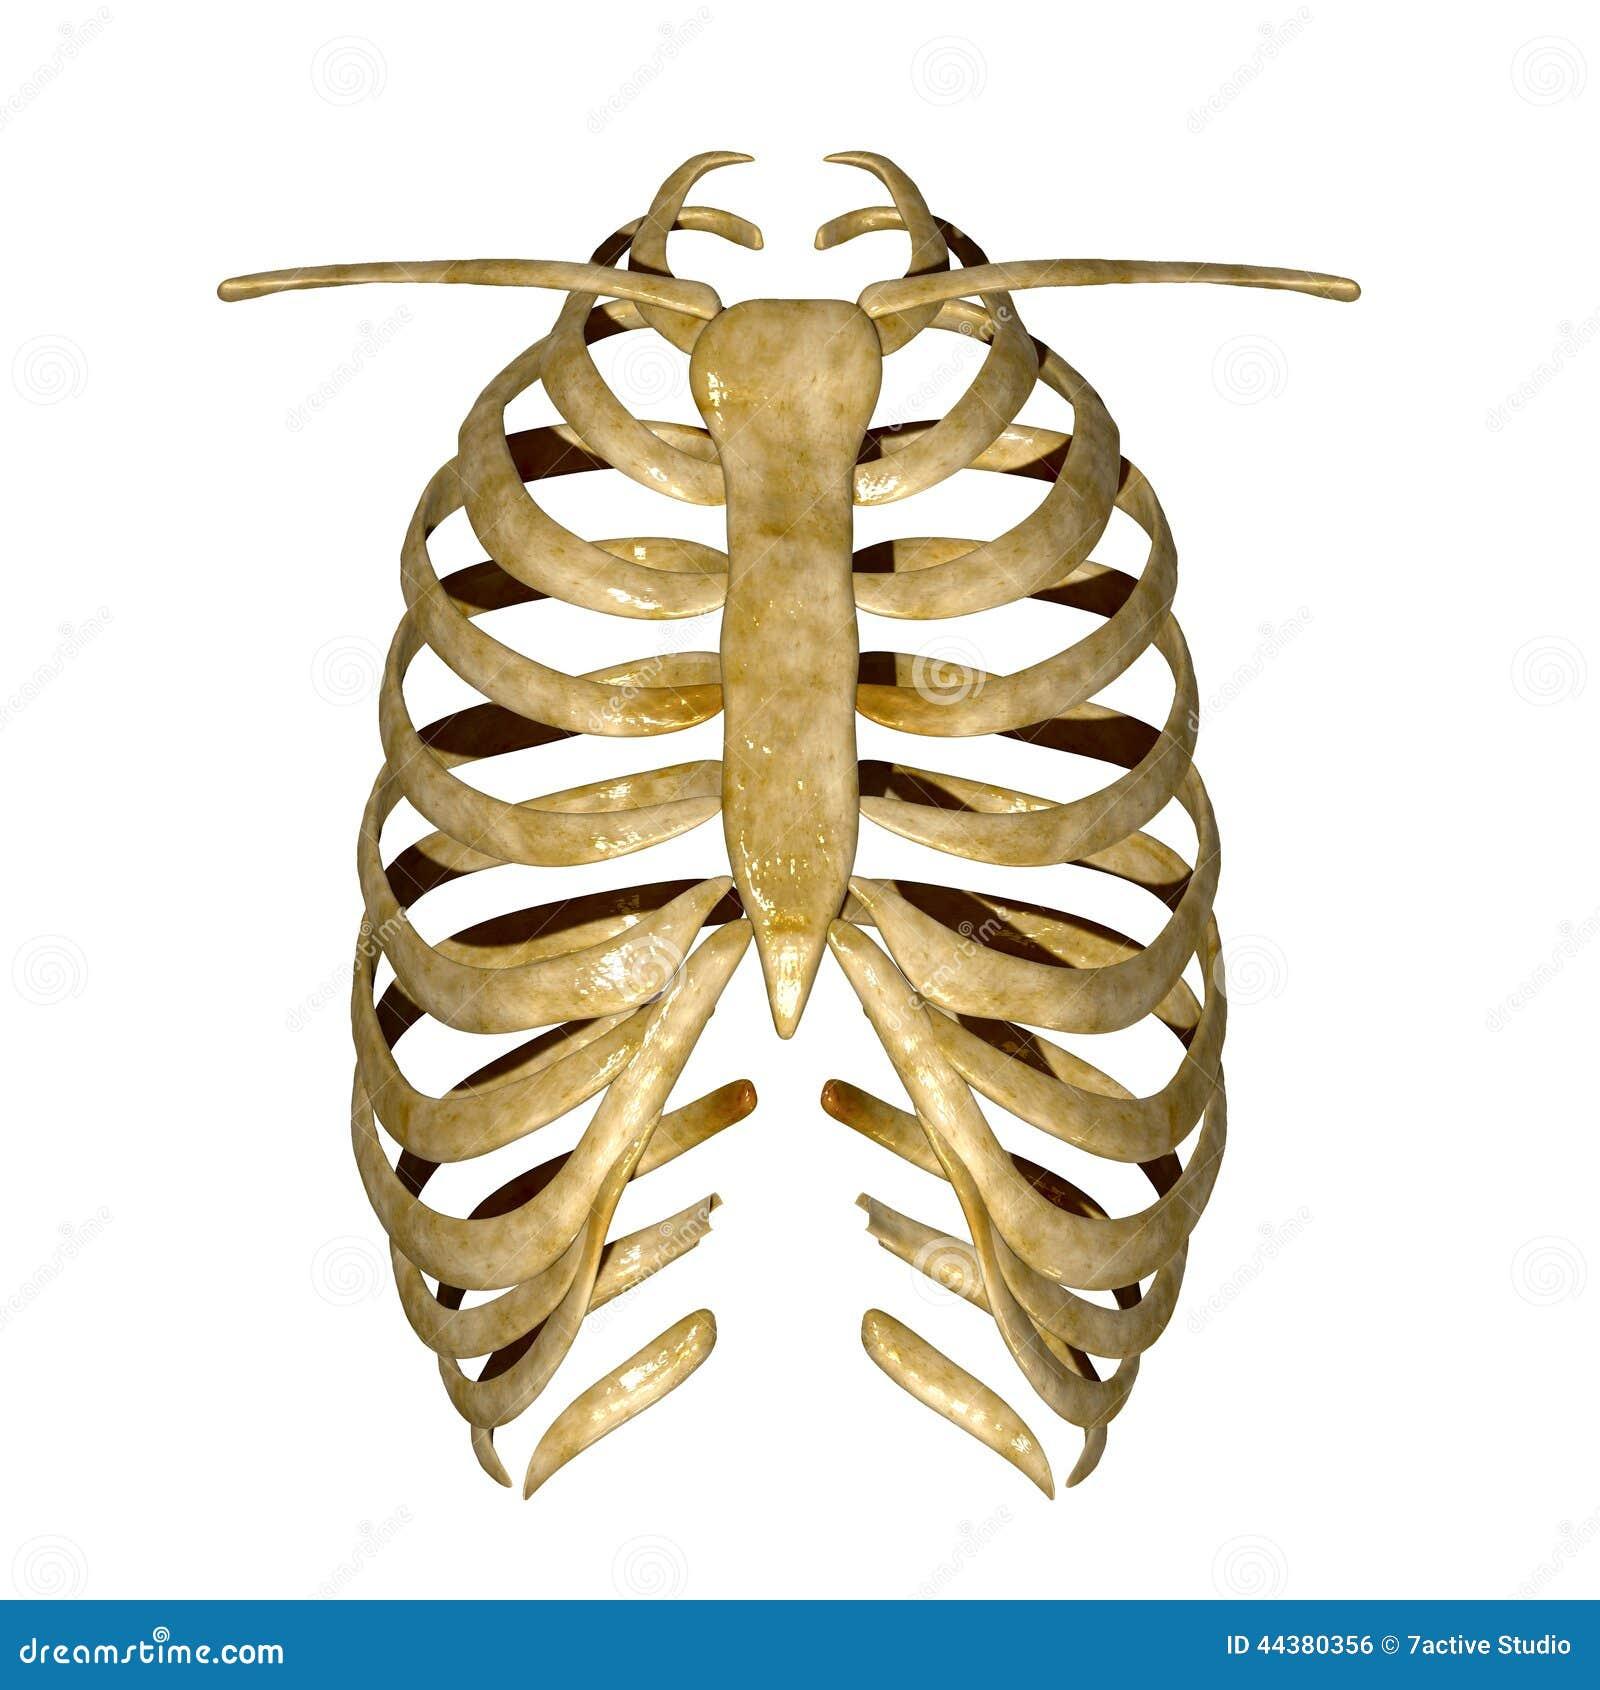 Stock Illustration Rib Cage Arrangement Bones Thorax All Vertebrates Except L rey Formed Vertebral Column Image44380356